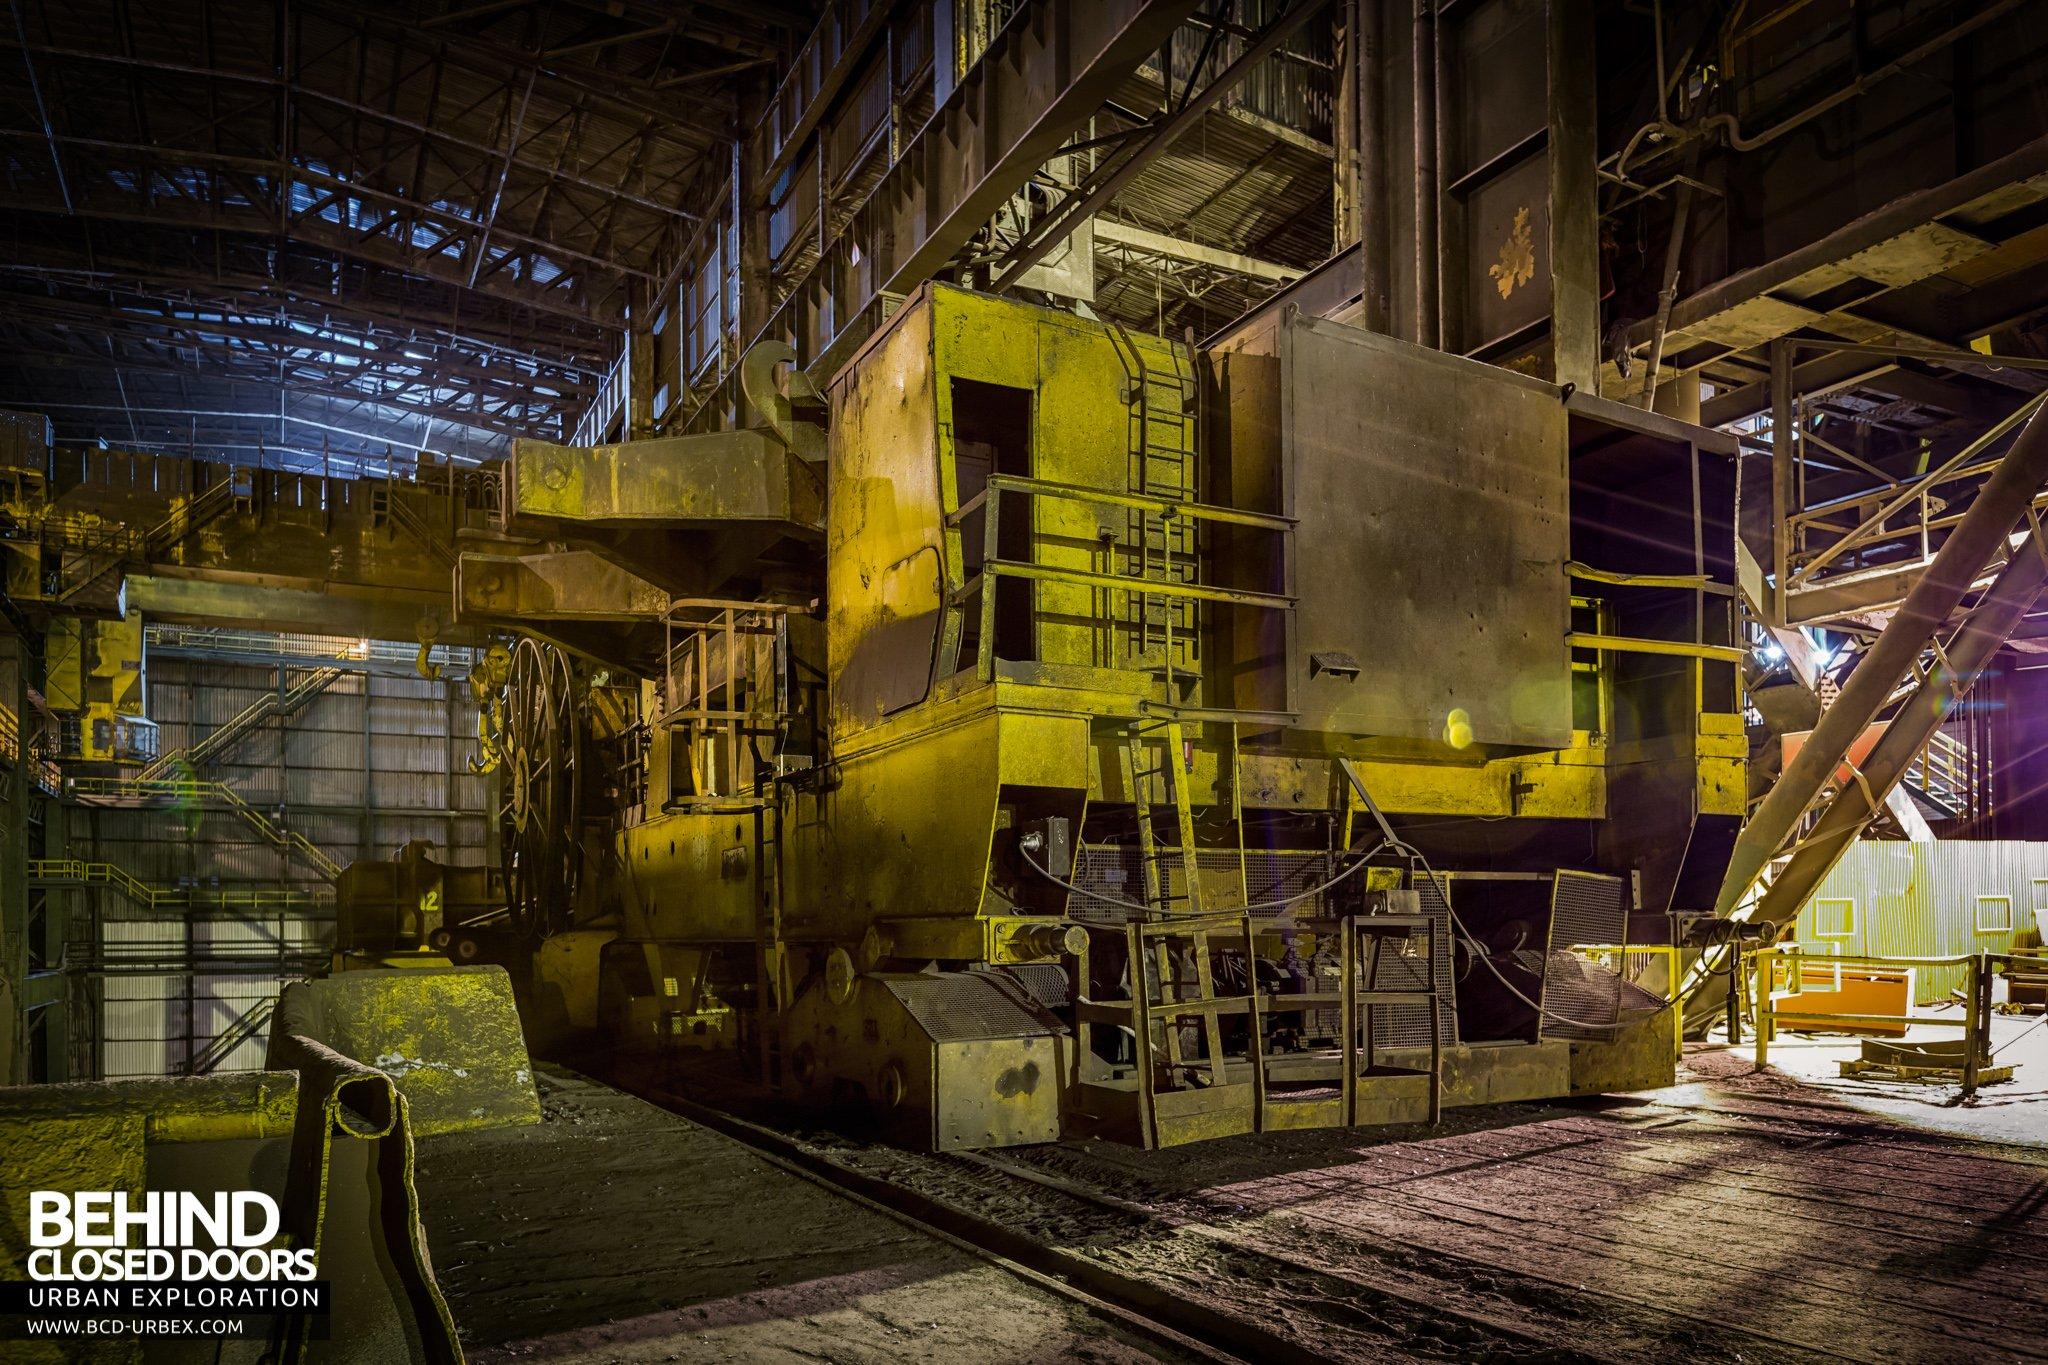 Lackenby Steelworks Redcar Uk 187 Urbex Behind Closed